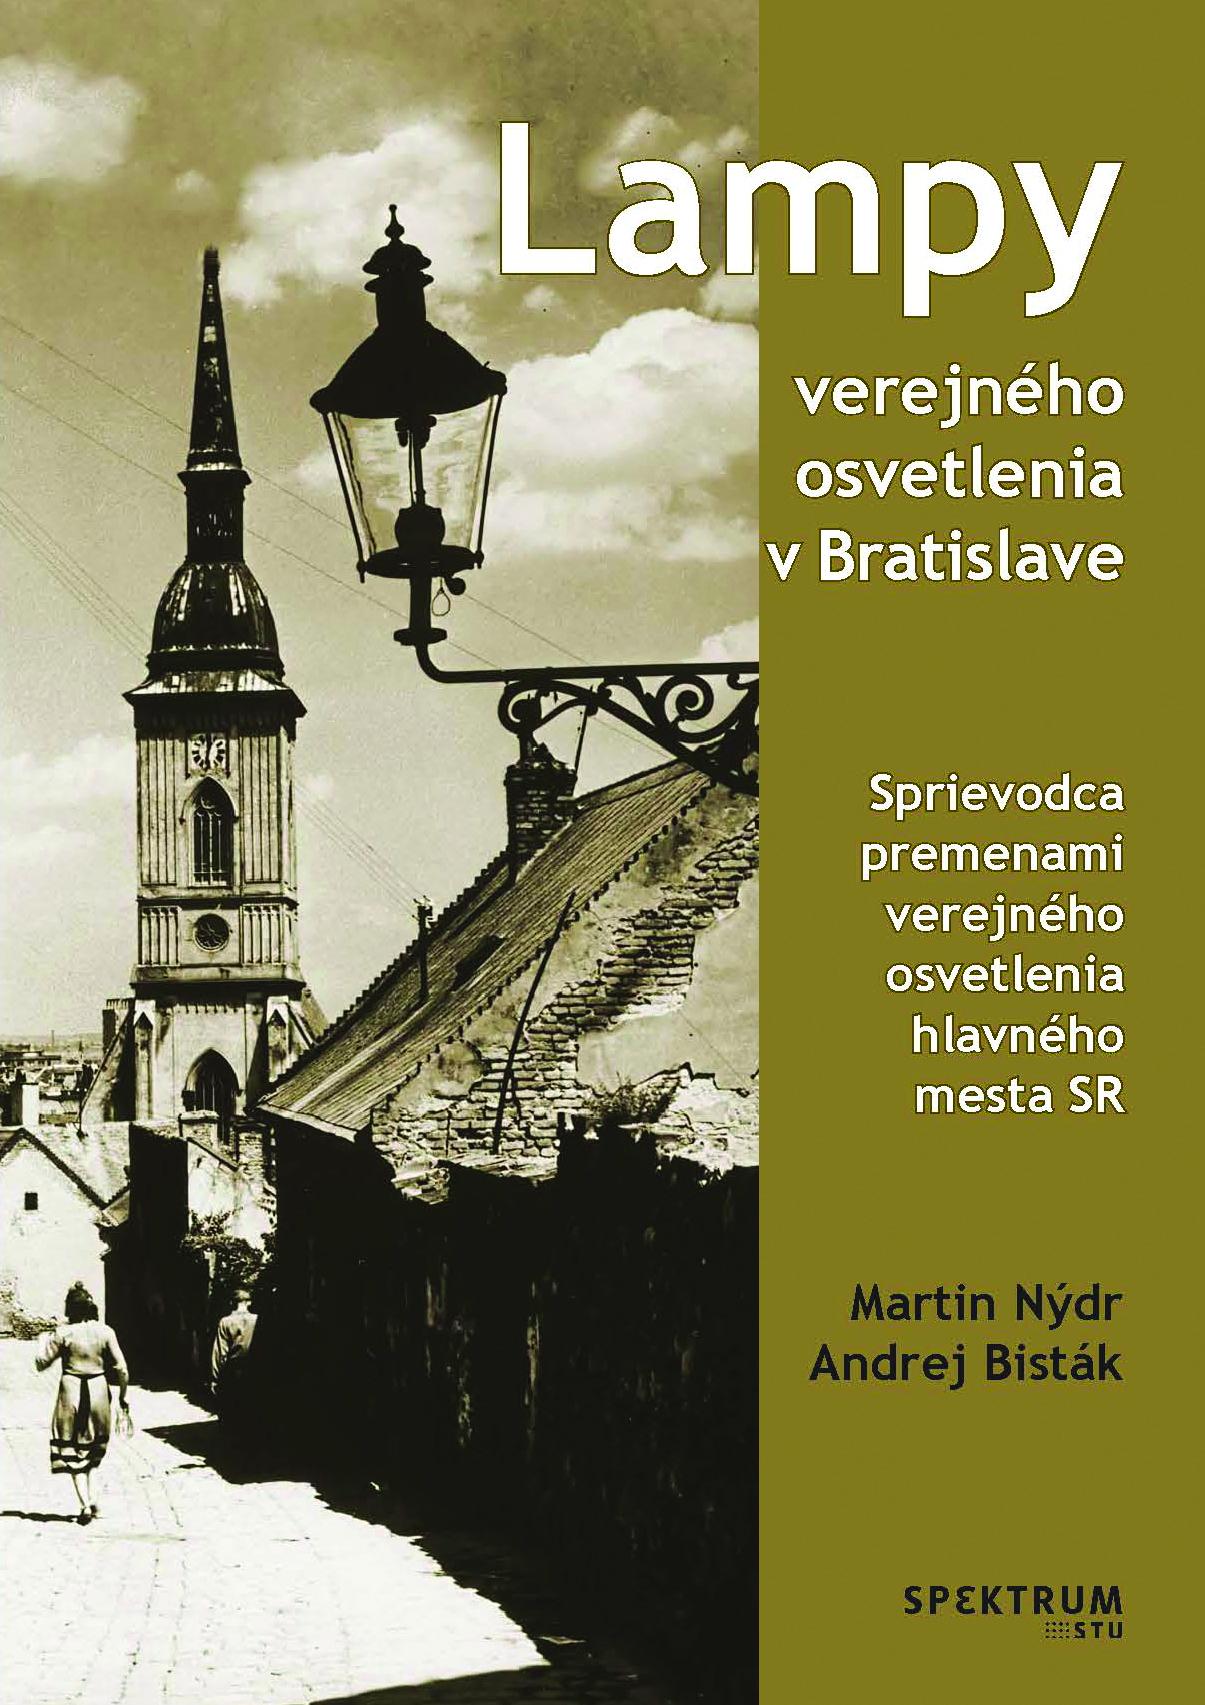 Lampy verejného osvetlenia v Bratislave